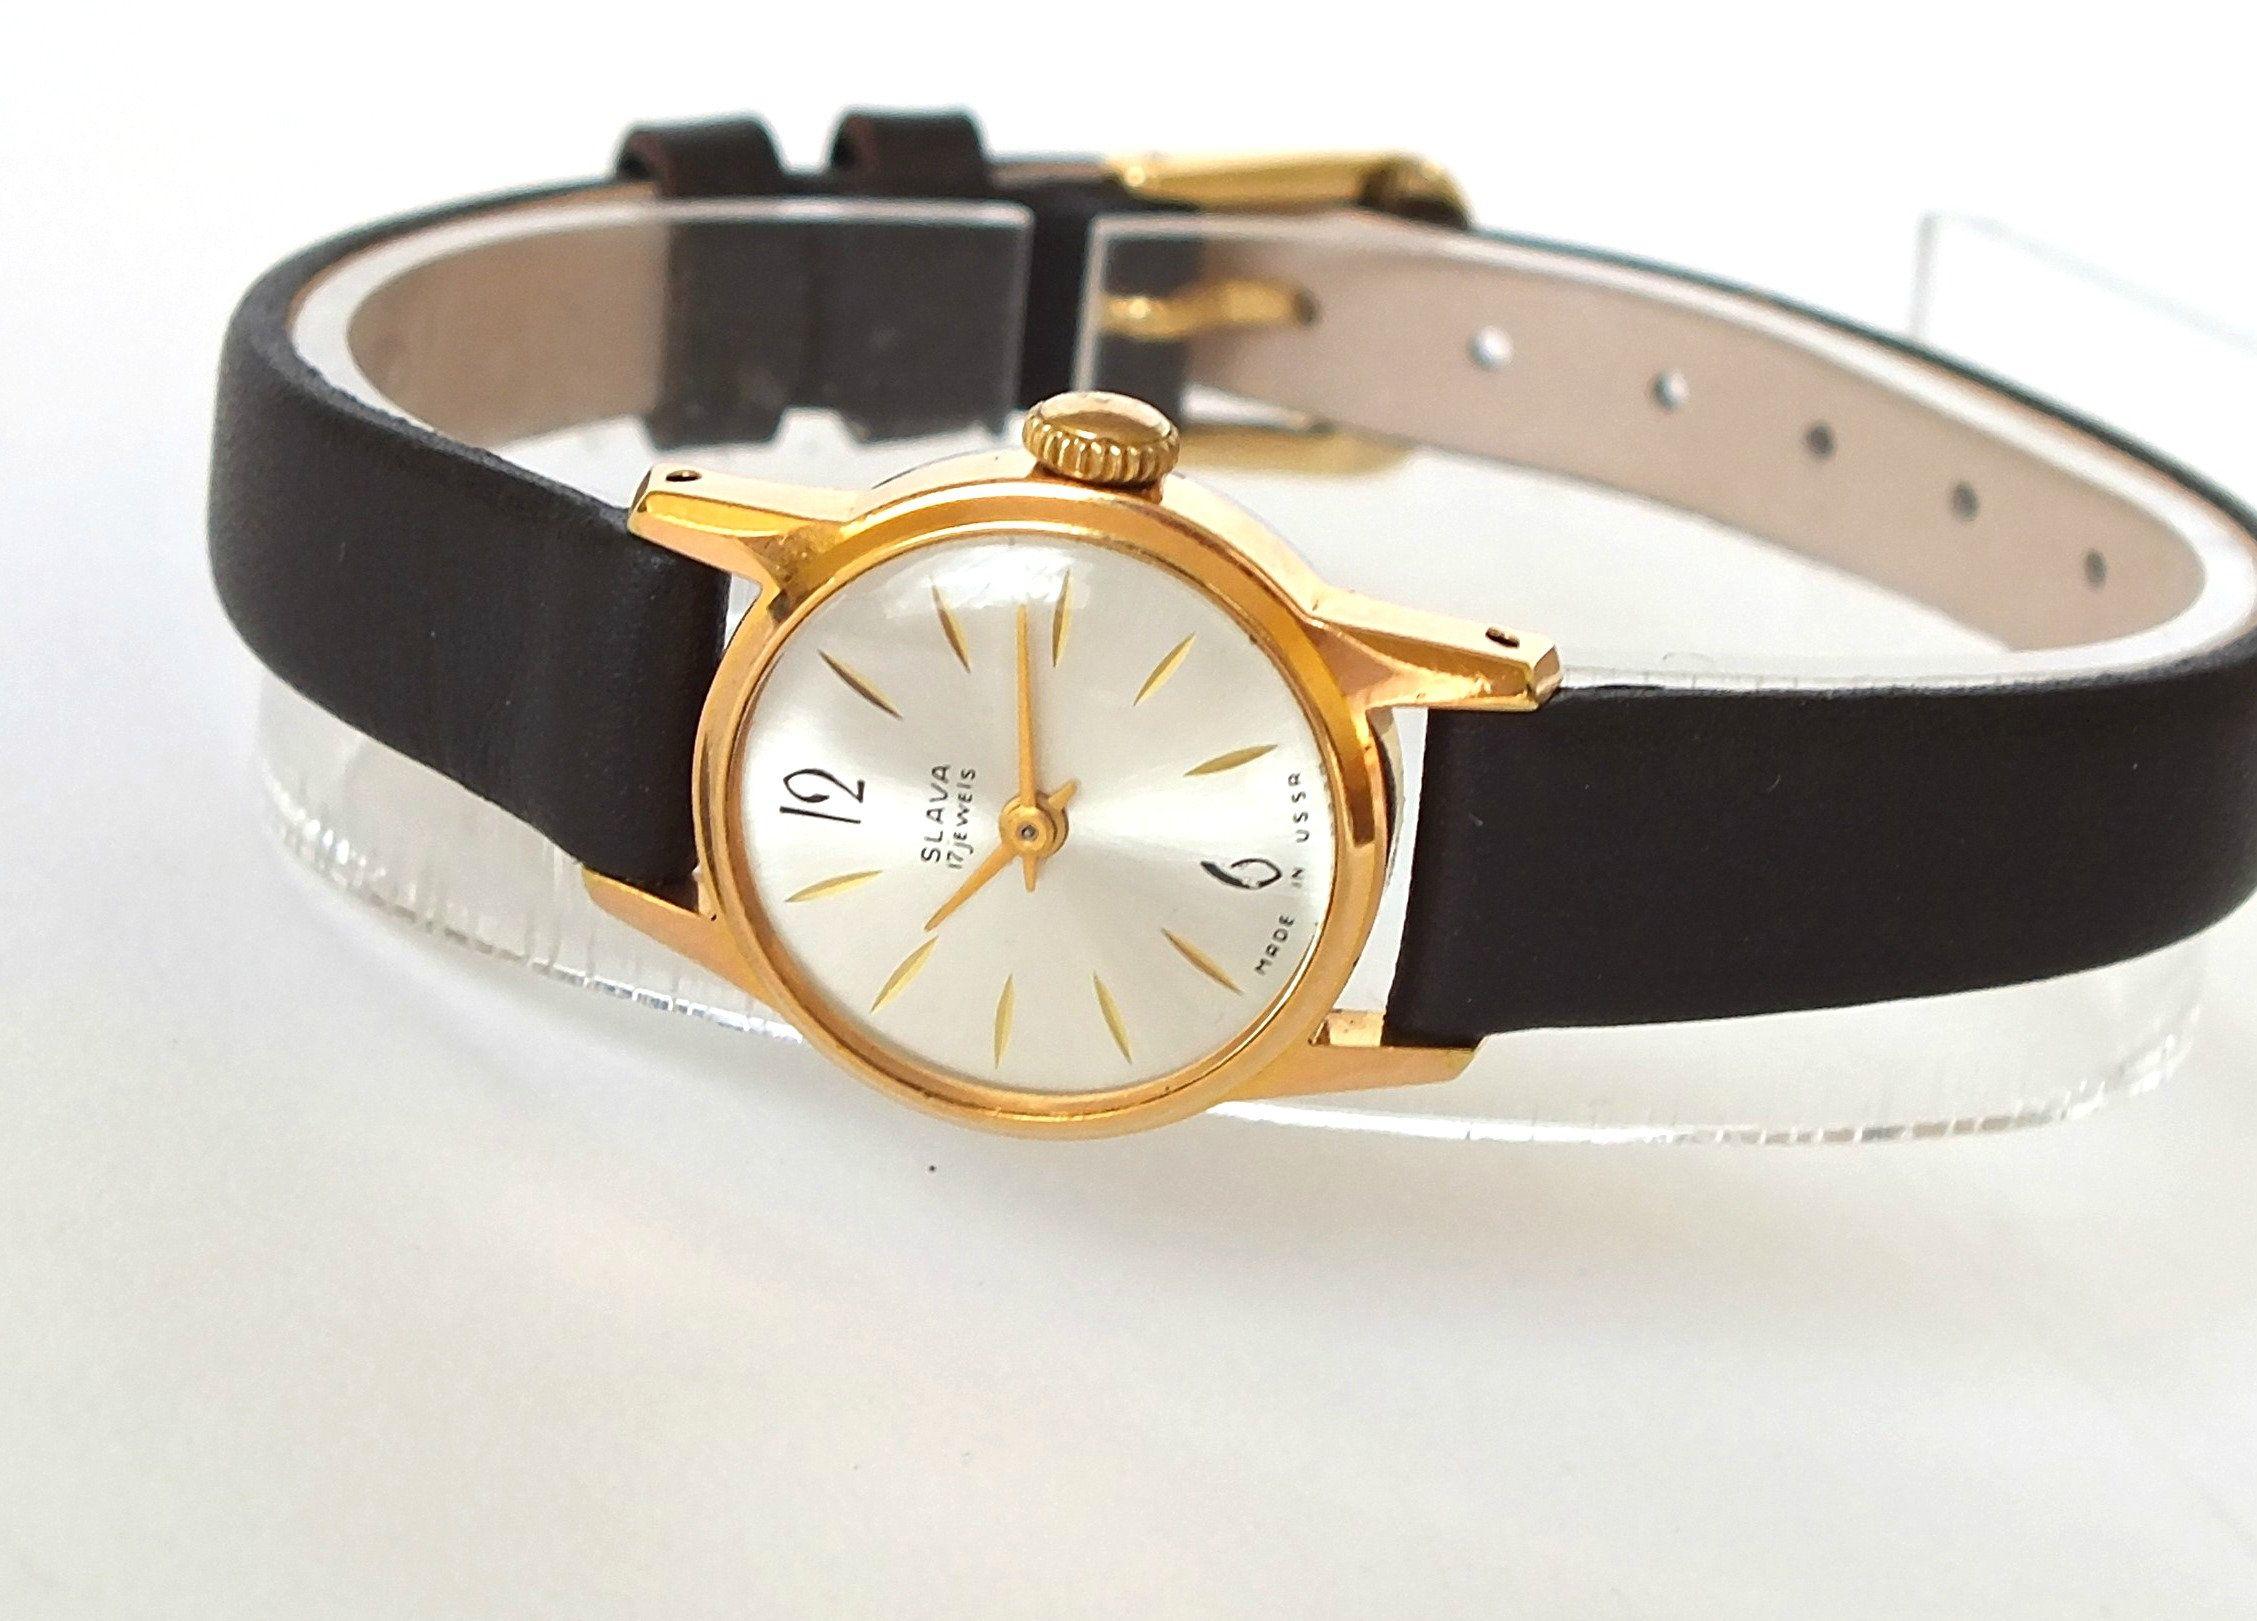 1108a62d43c Small elegant womens watch rare ladies wrist watch slava glory jpg  2257x1621 Elegant ladies gold watches